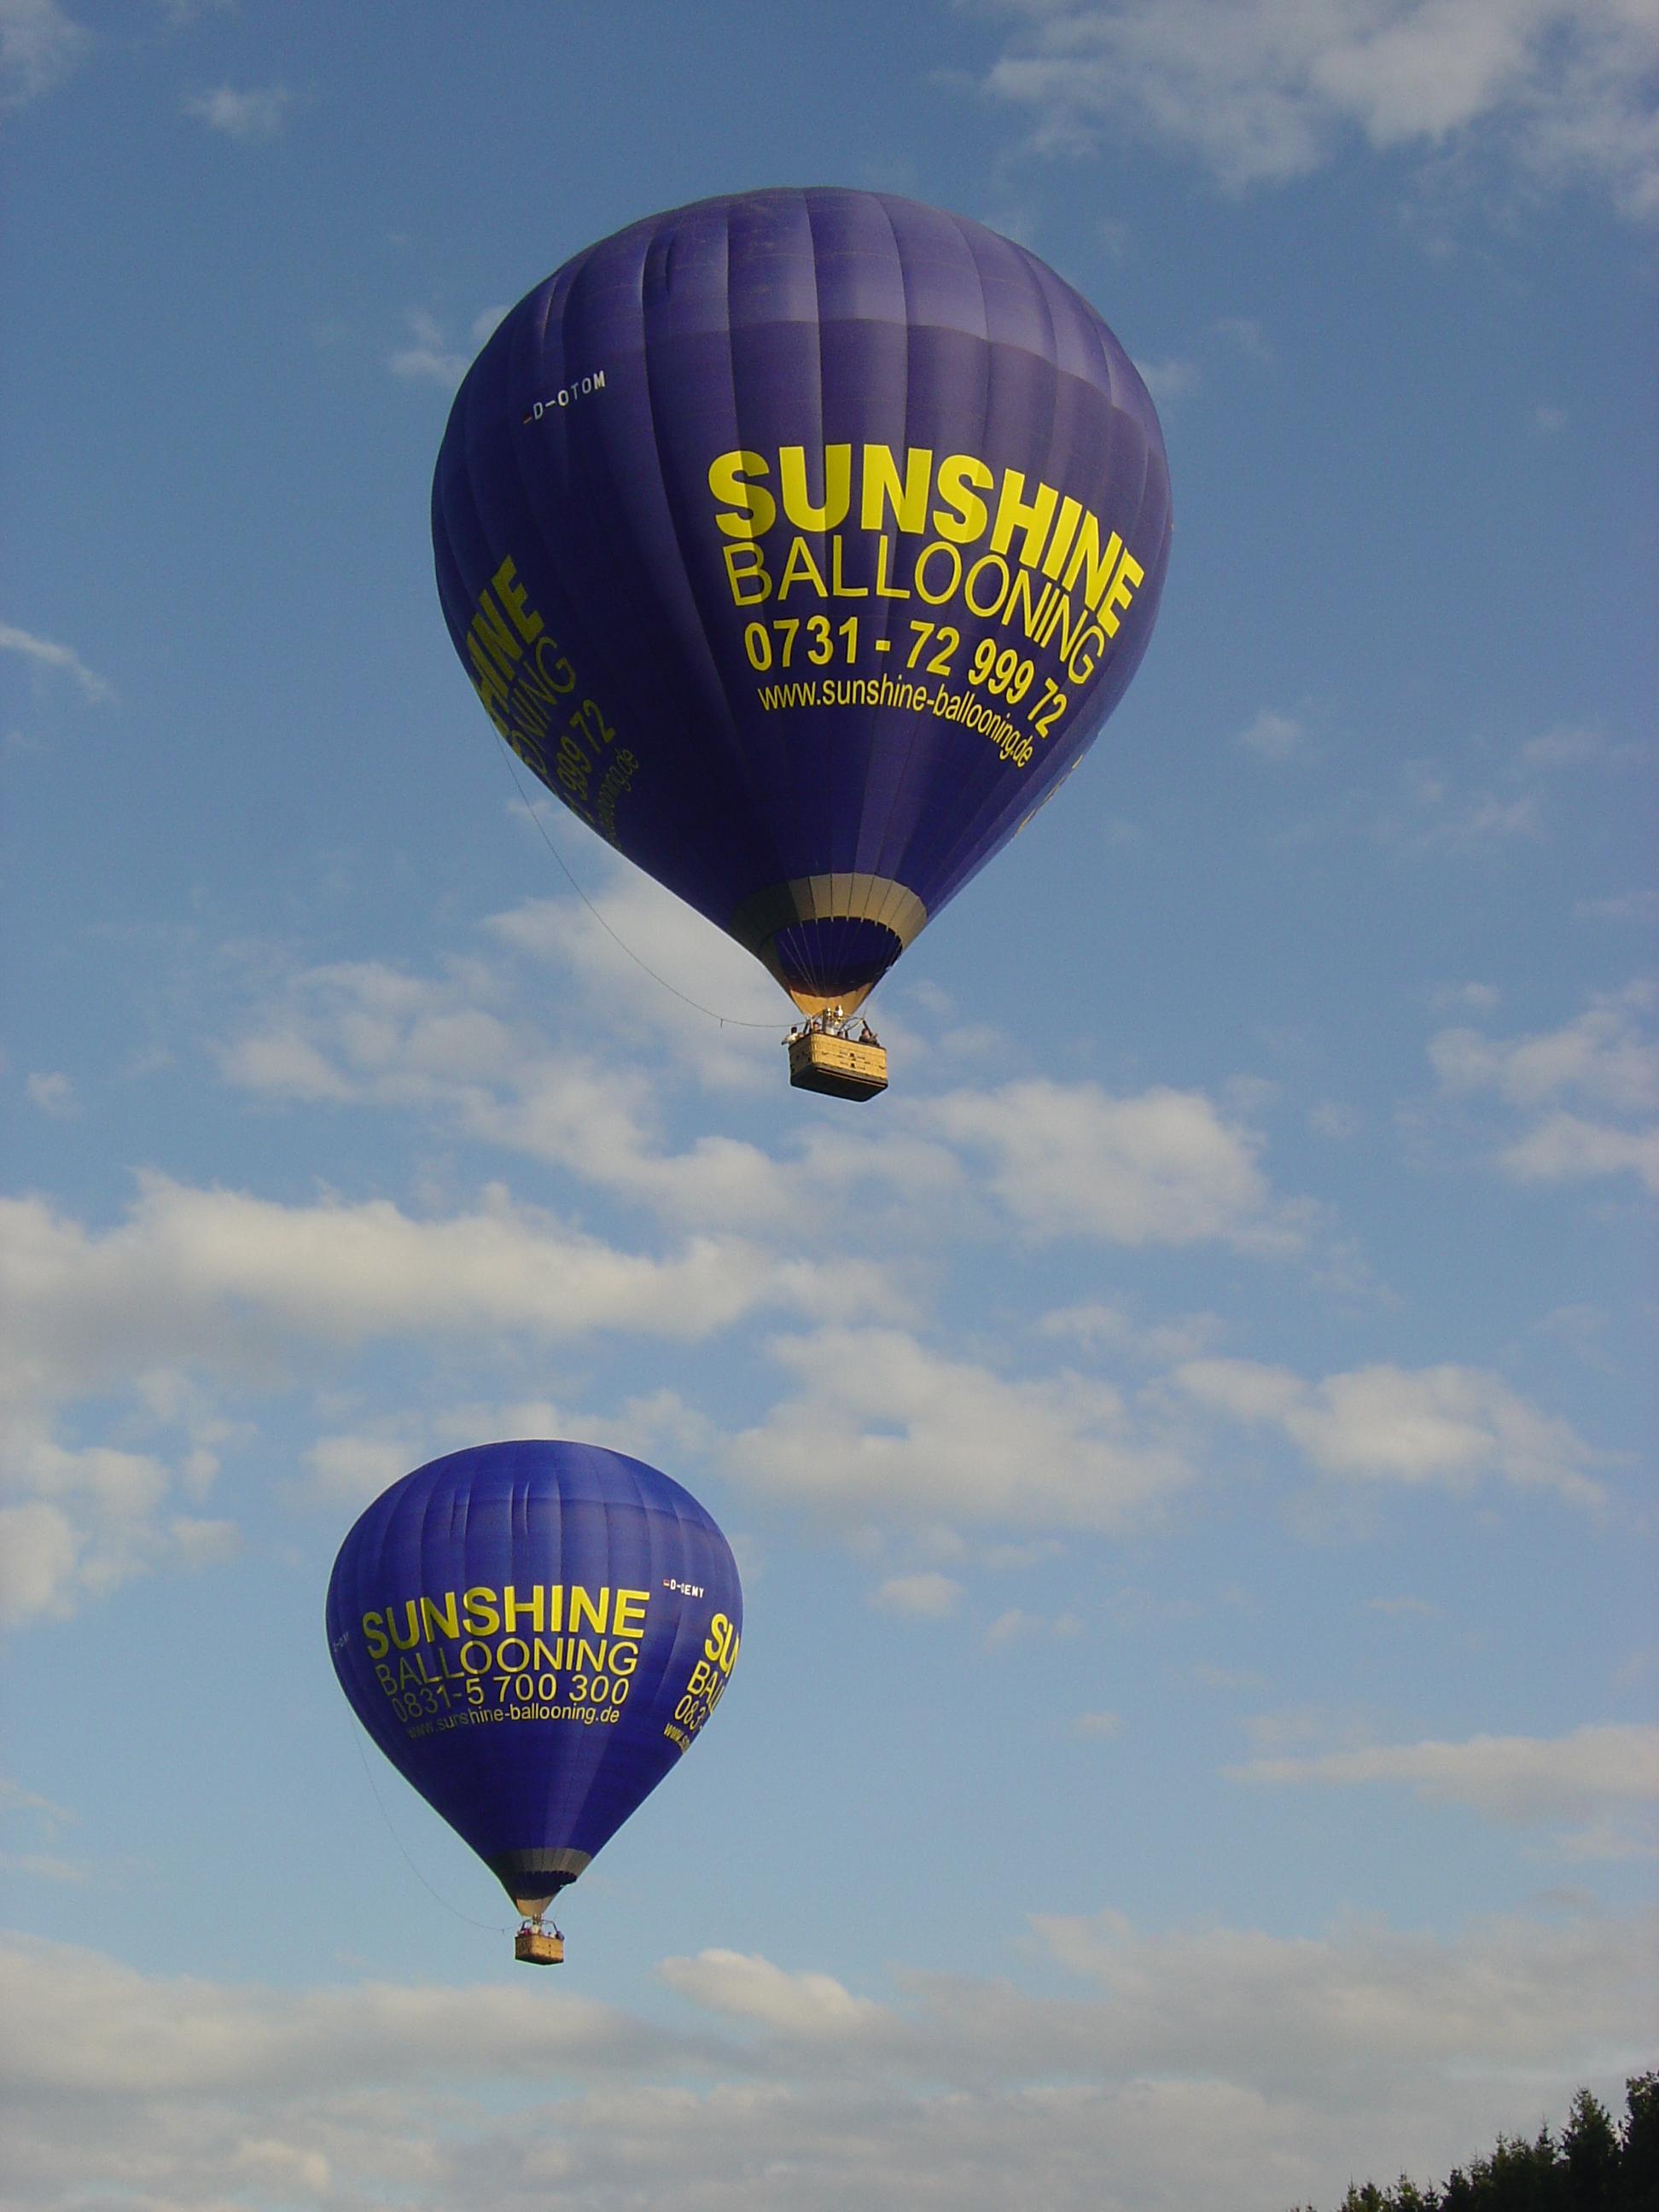 Ballonfahrt Bodensee Abfahrt